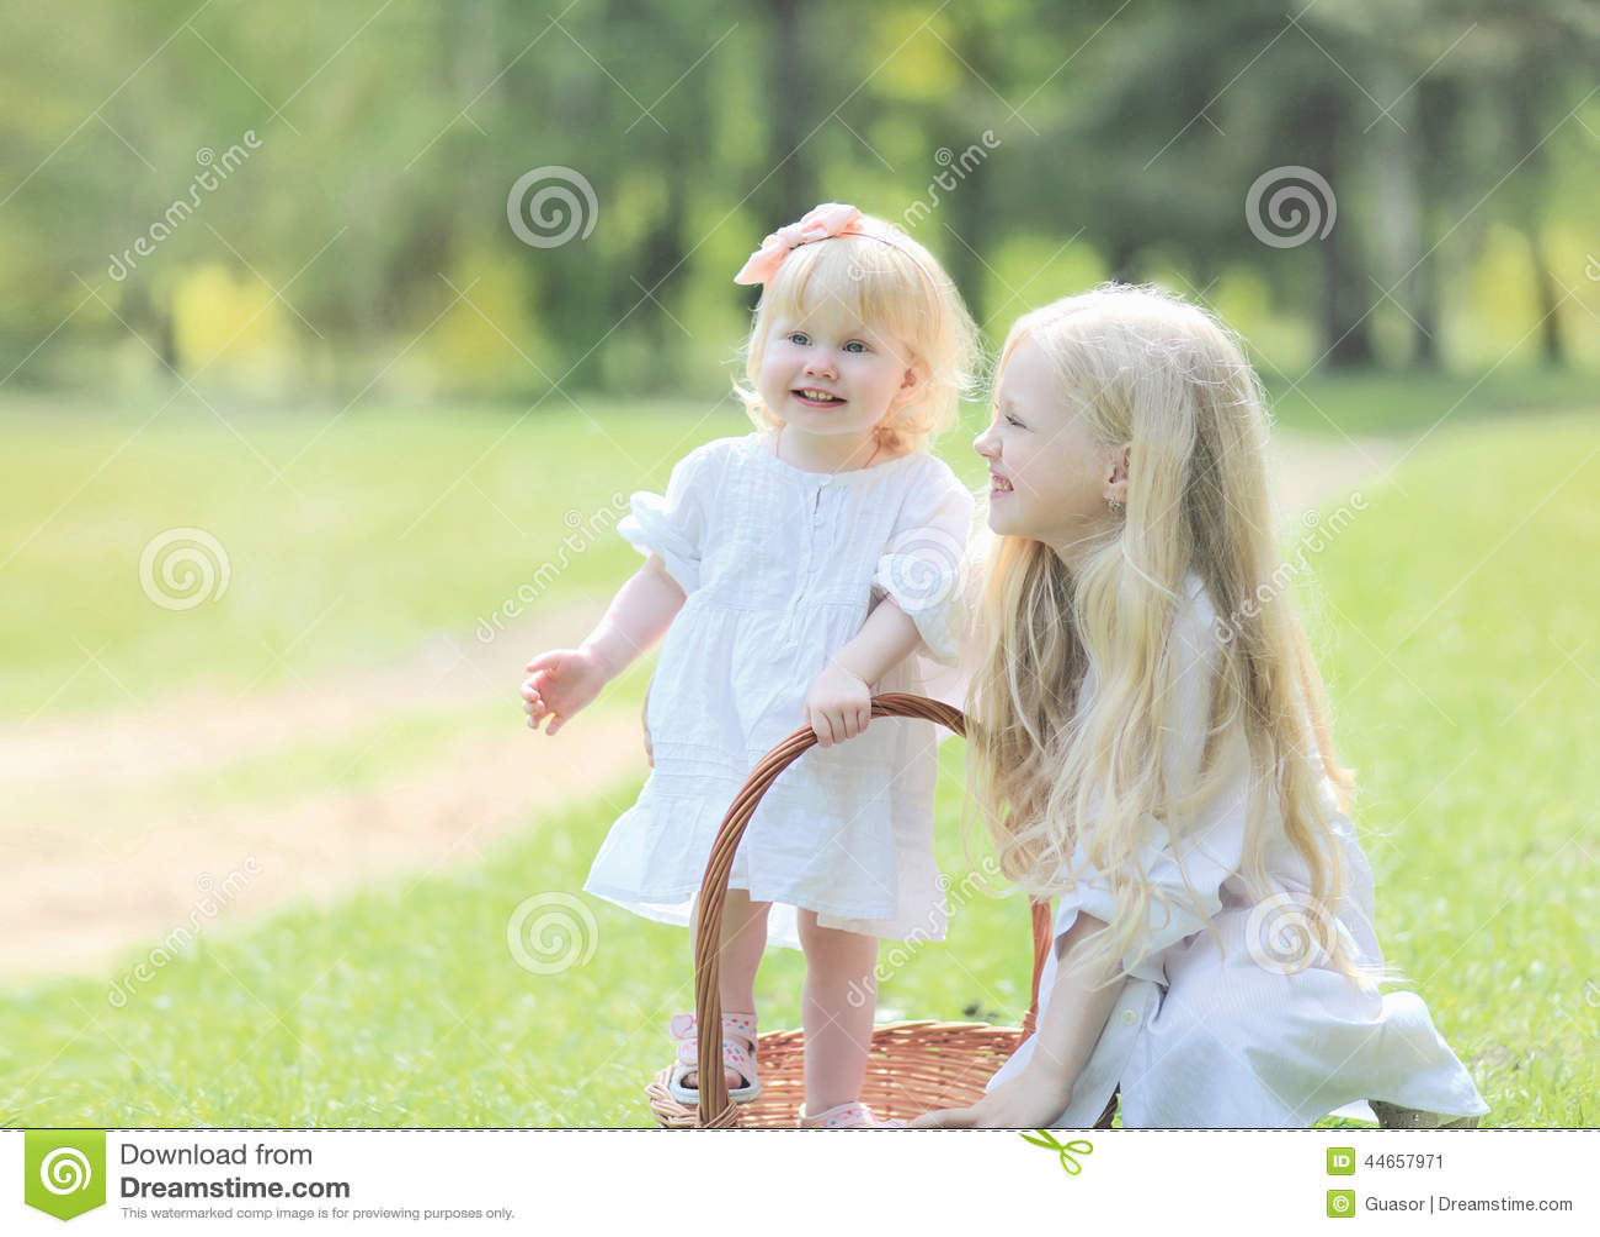 Pervers baise sa petite soeur encore vierge - orgietvcom